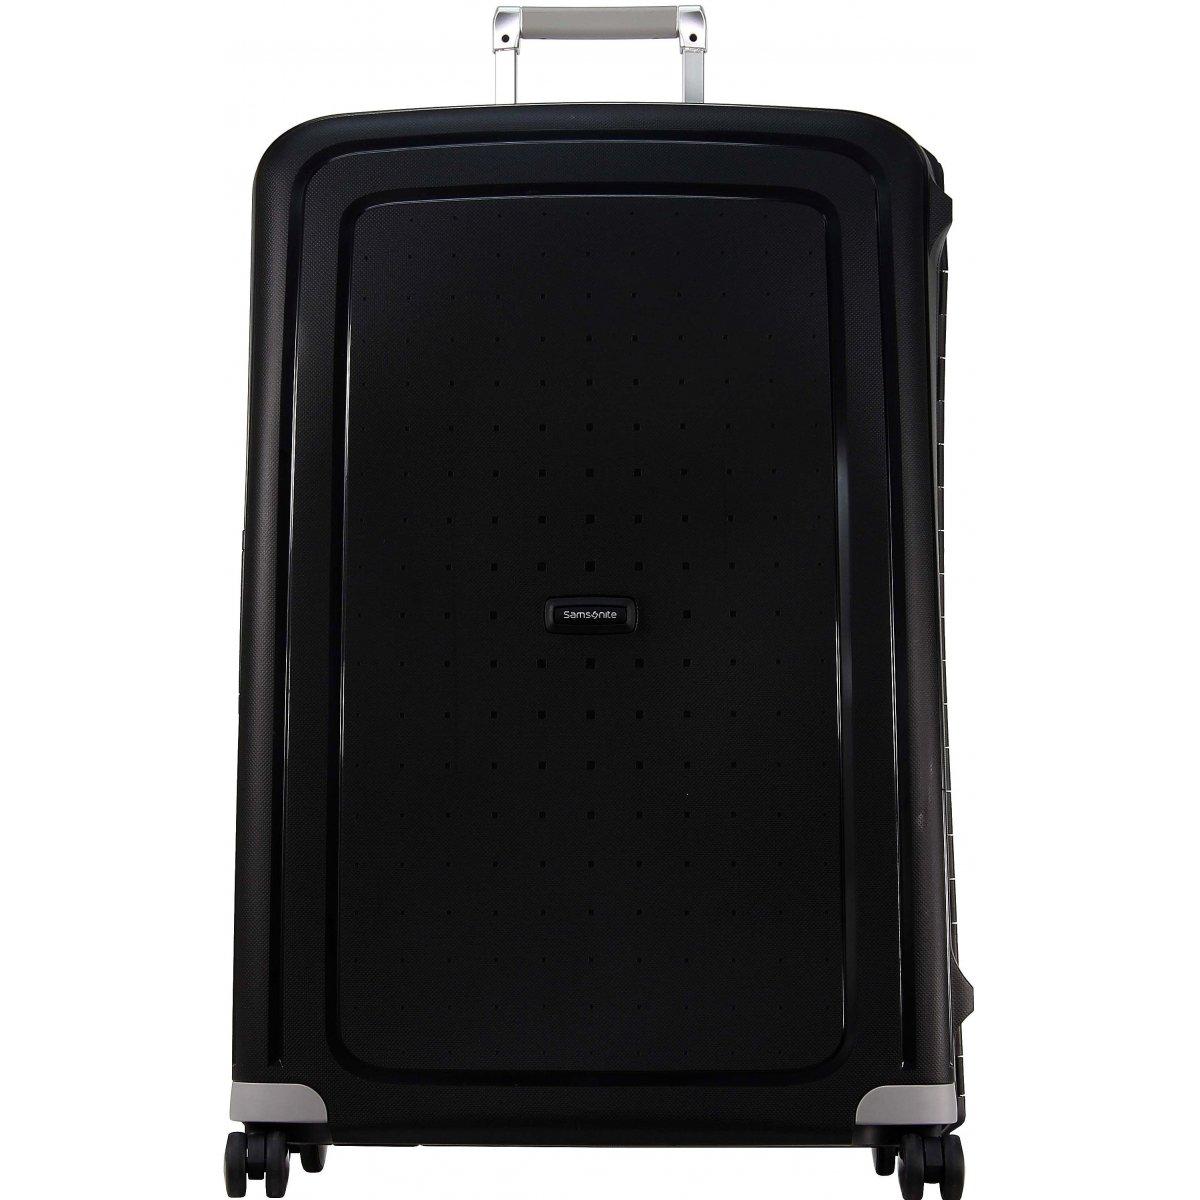 valise samsonite s 39 cure spinner 81cm scure44 couleur principale noir valise pas cher. Black Bedroom Furniture Sets. Home Design Ideas